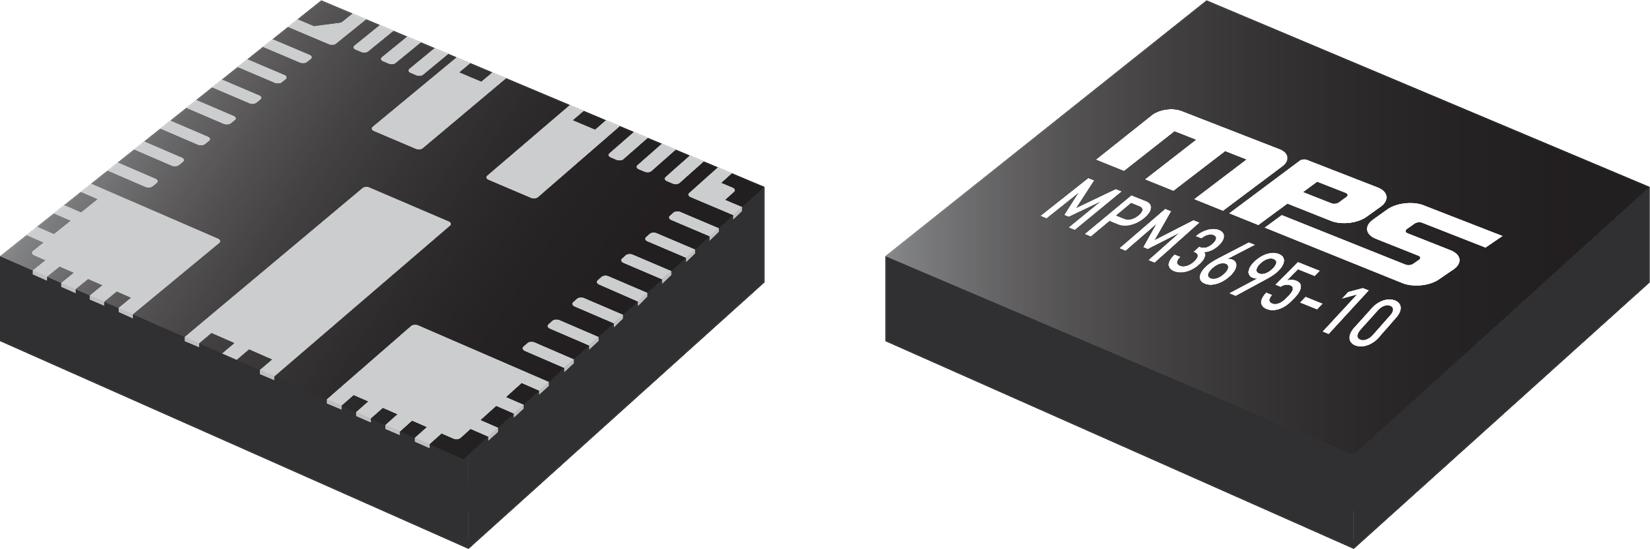 Figure 3: MPM3695-10, Ultra-Thin 10A Power Module